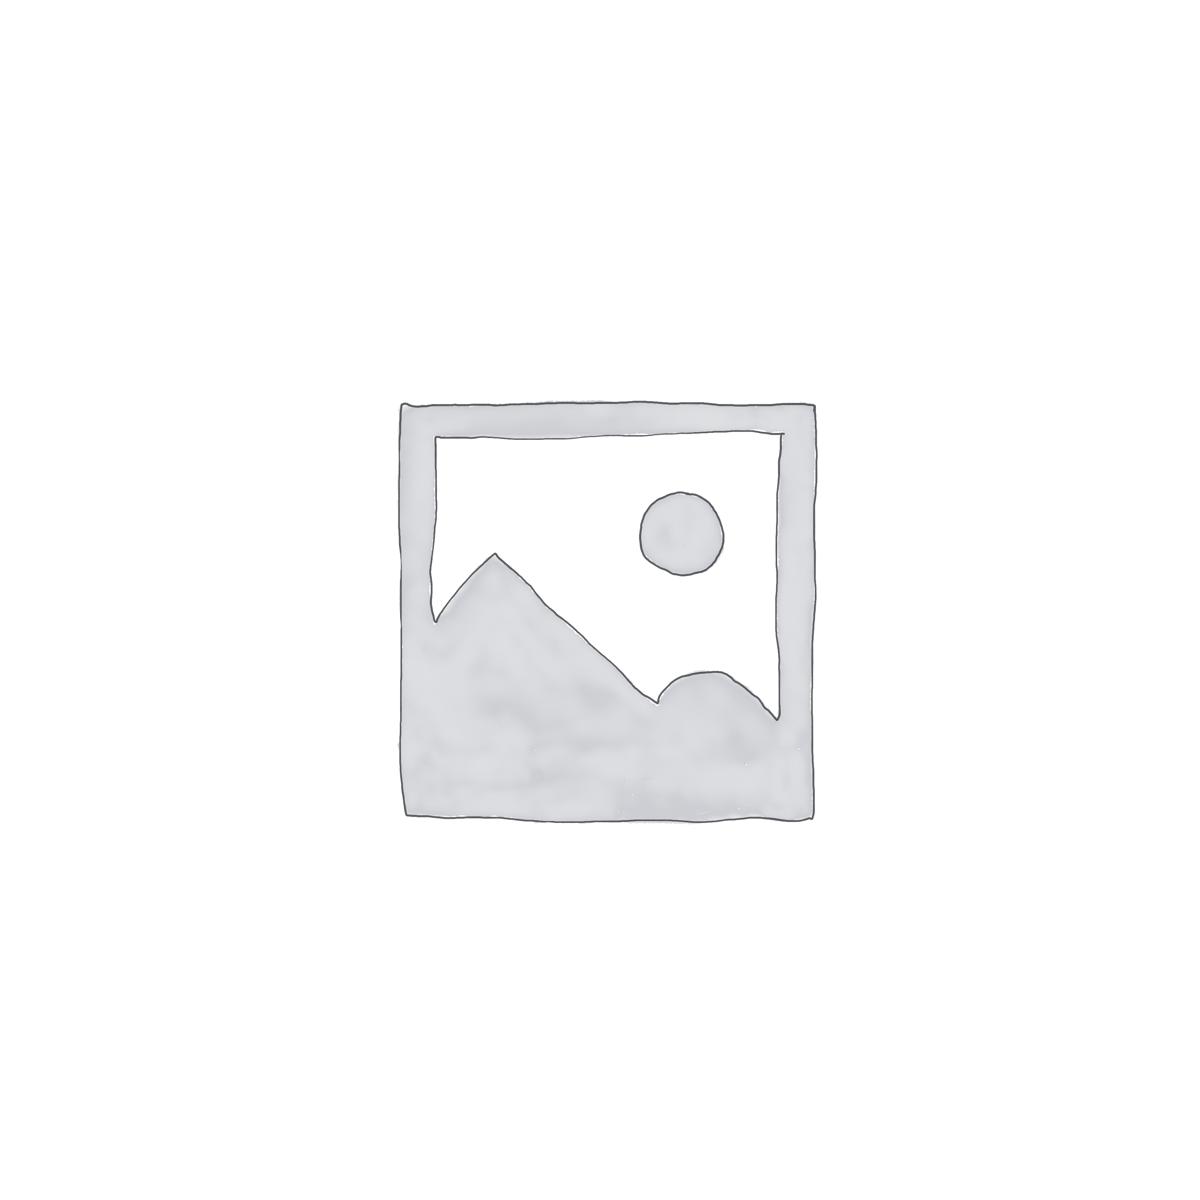 Green Pine Branches Wallpaper Mural